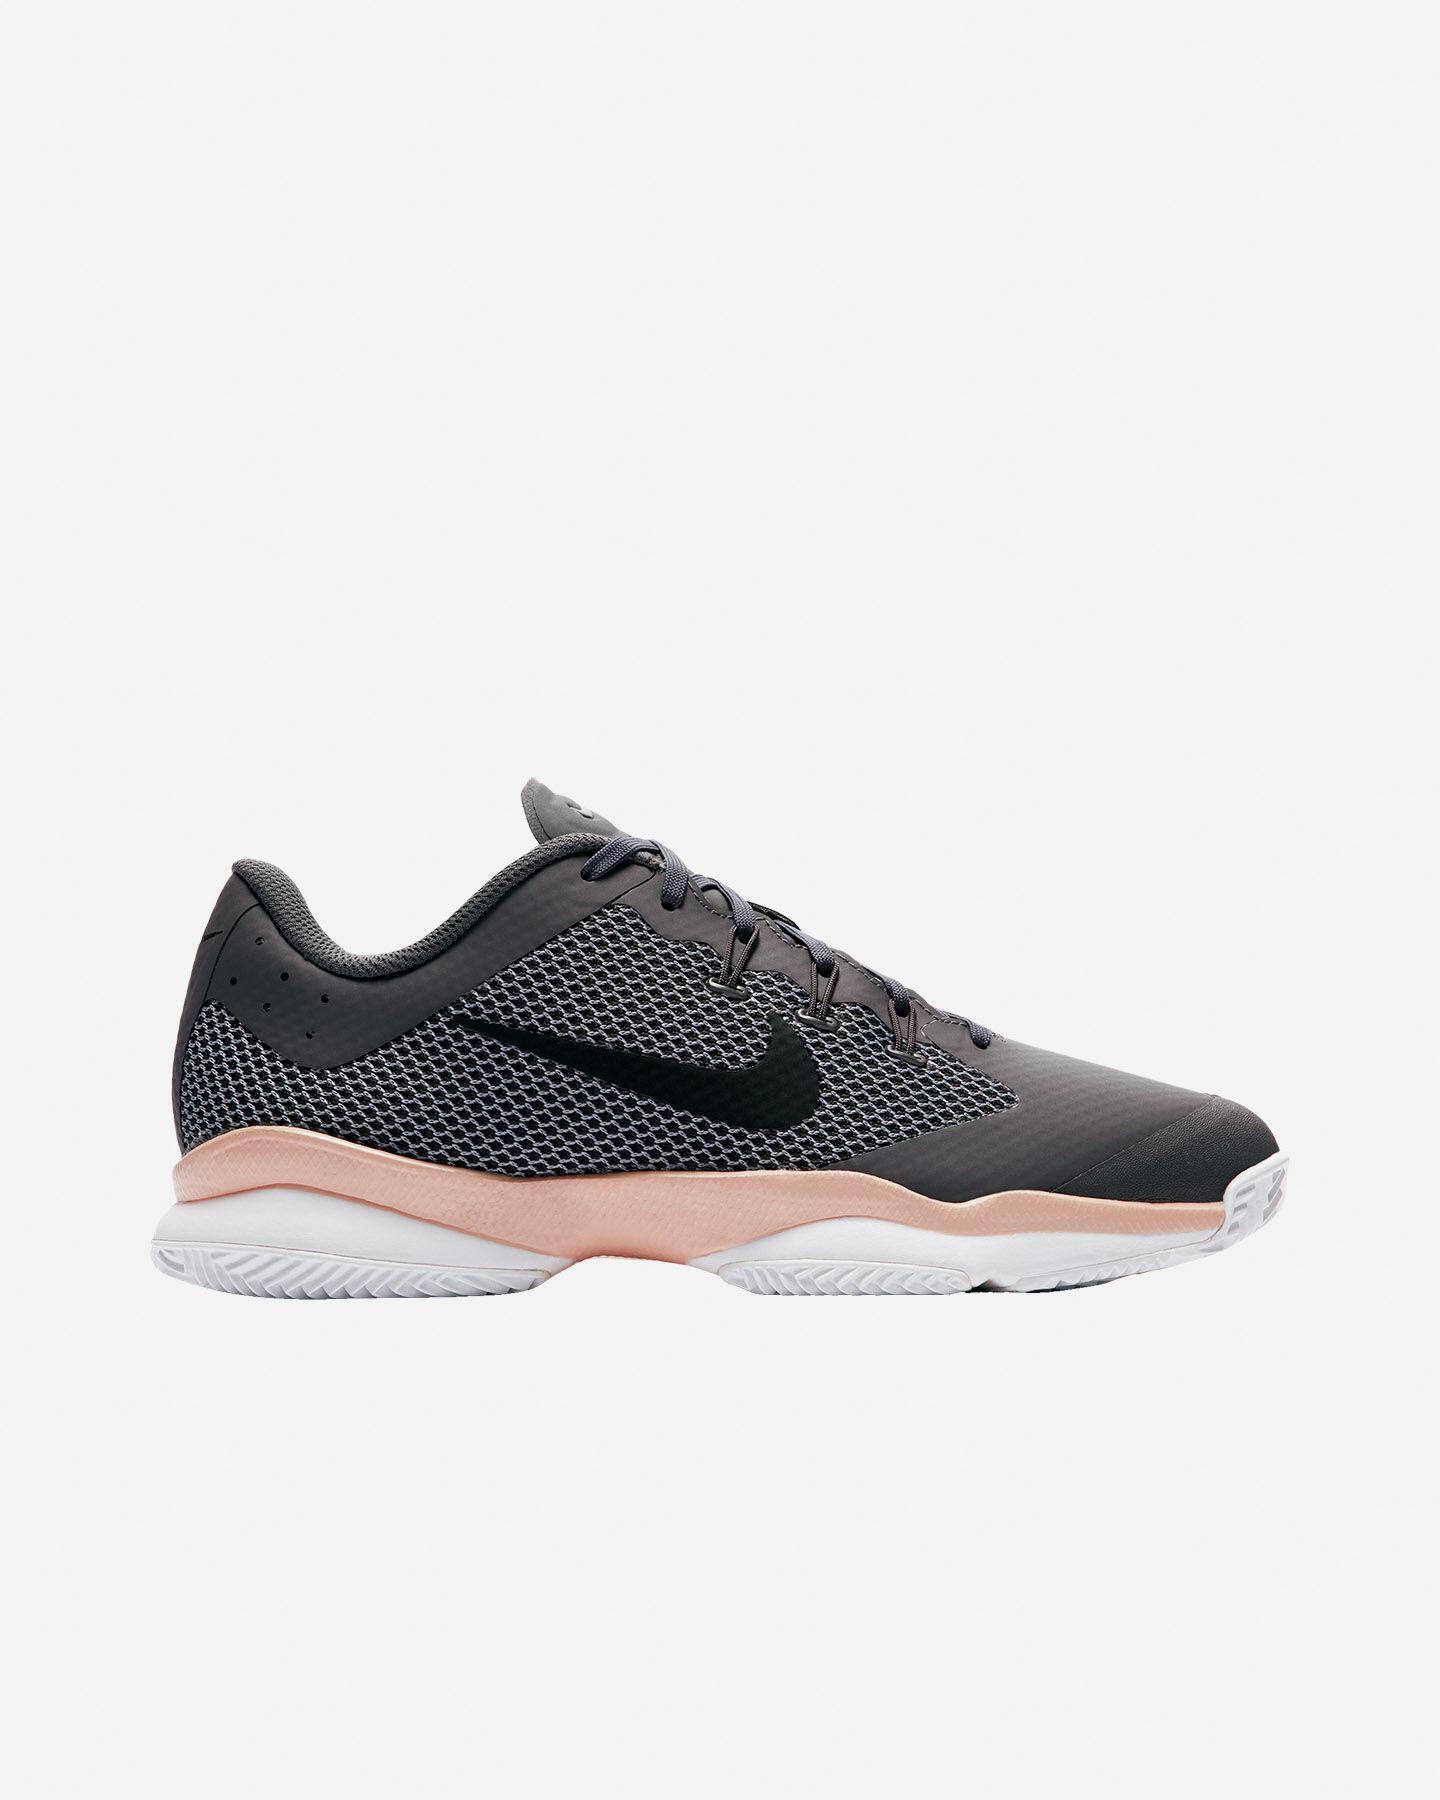 migliori scarpe tennis nike